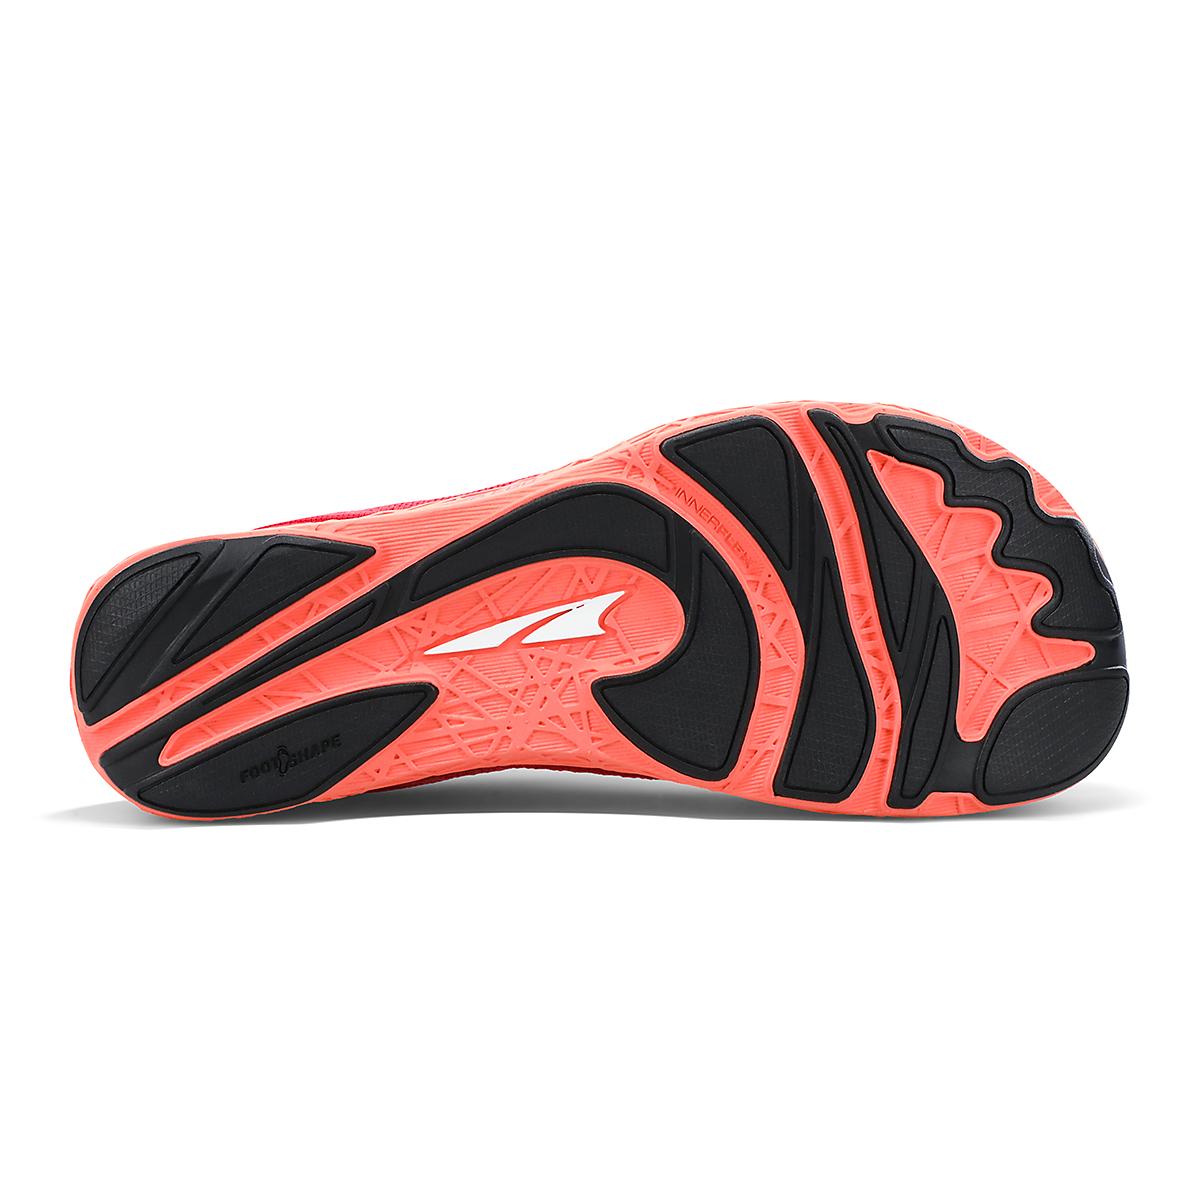 Women's Altra Escalante 2.5 Running Shoe - Color: Raspberry - Size: 5.5 - Width: Regular, Raspberry, large, image 4